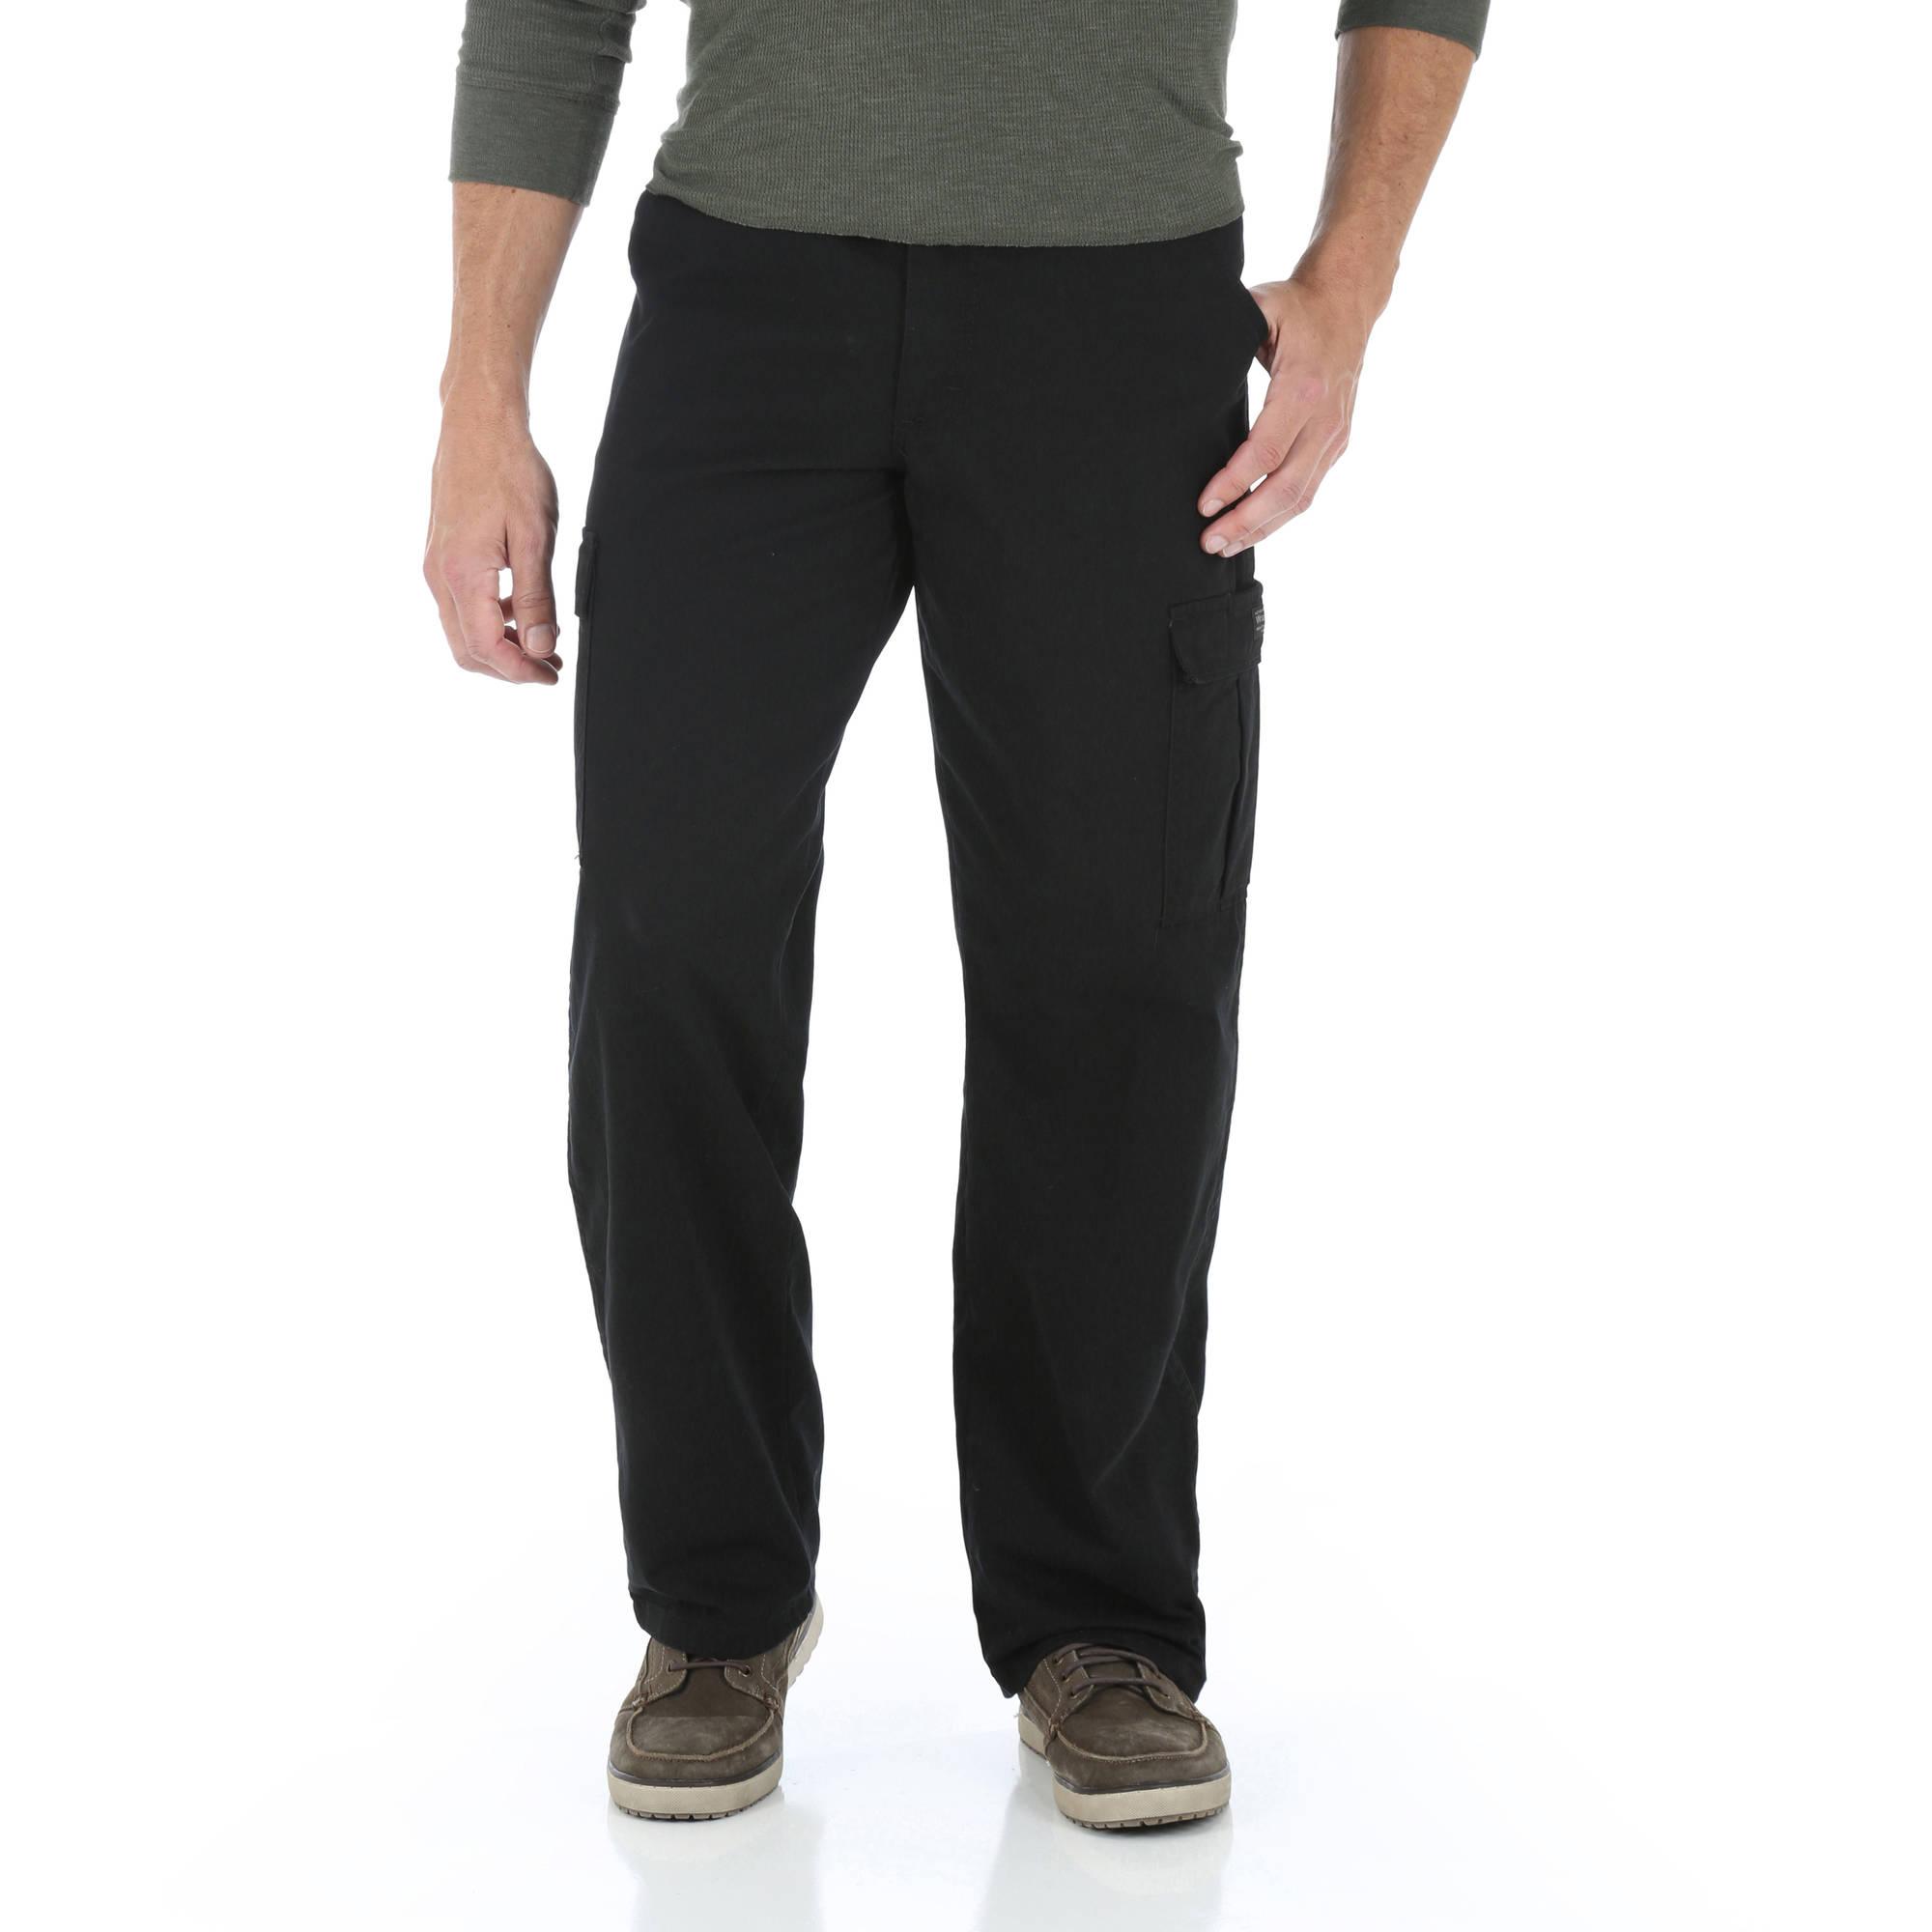 cargo jeans wrangler - menu0027s cargo pants or jeans, 2 pack - walmart.com brvqgzl